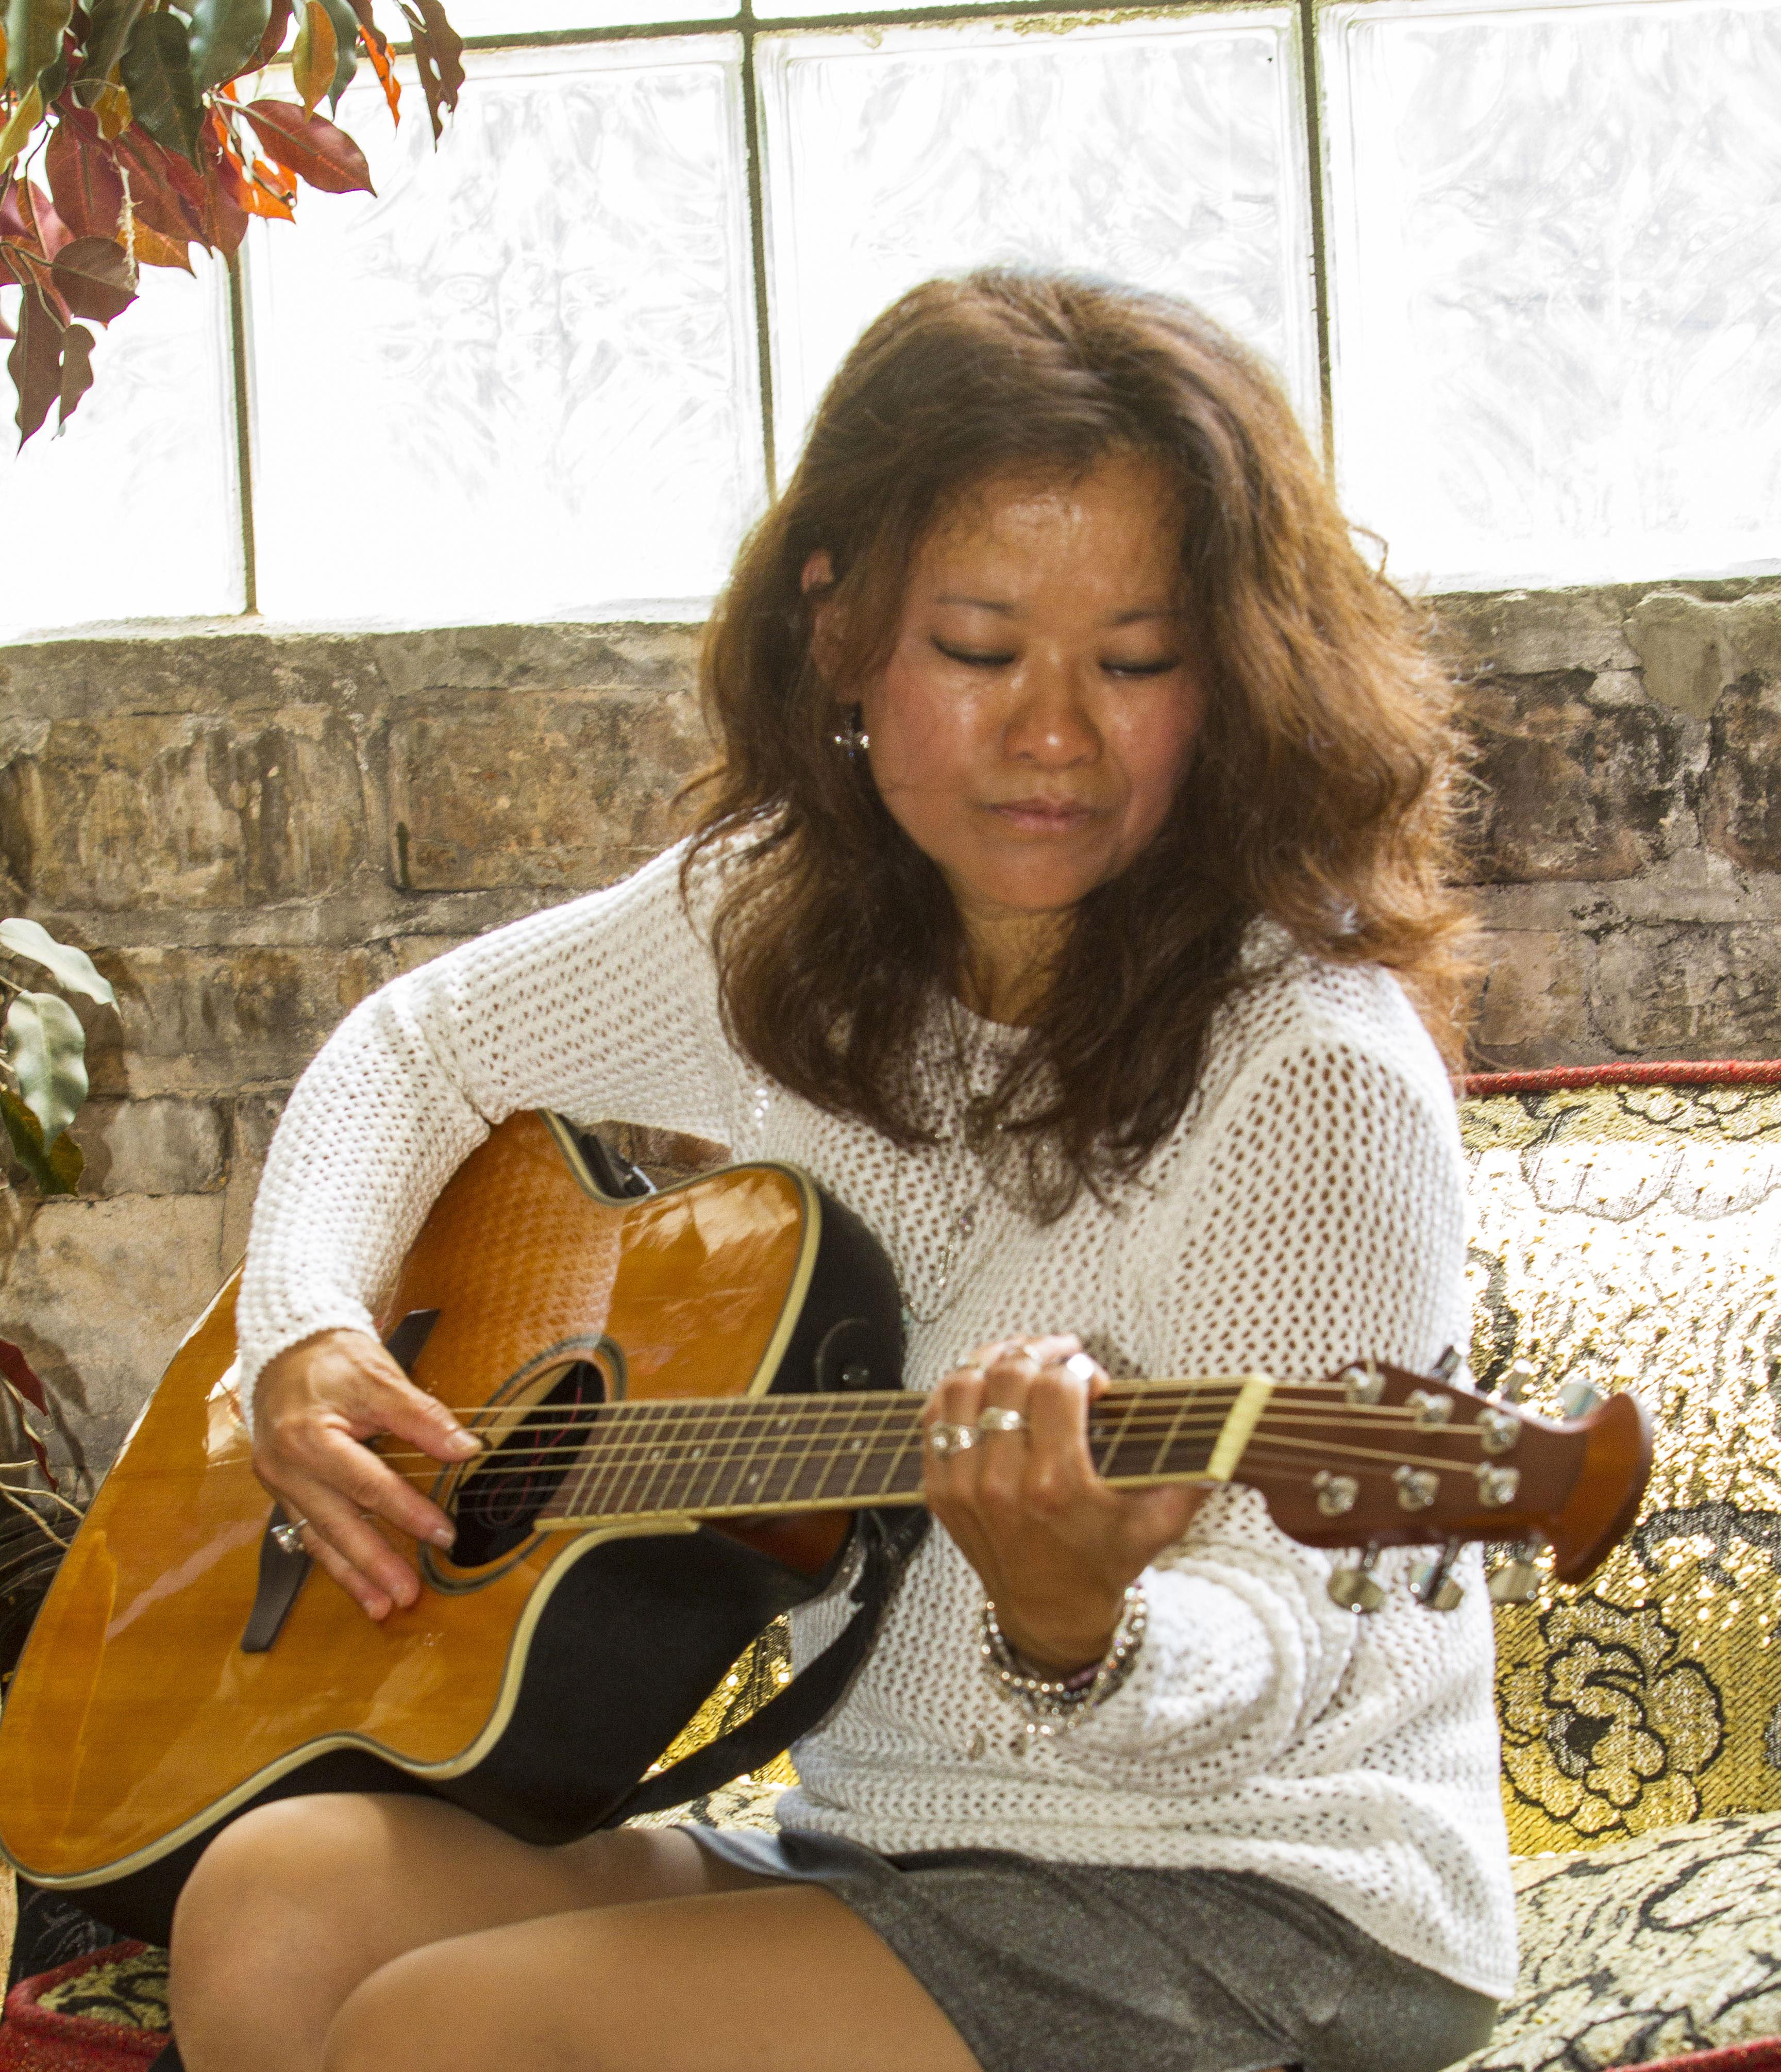 Kimberly__Acoustic-Solo_Gig_MG_0141-1